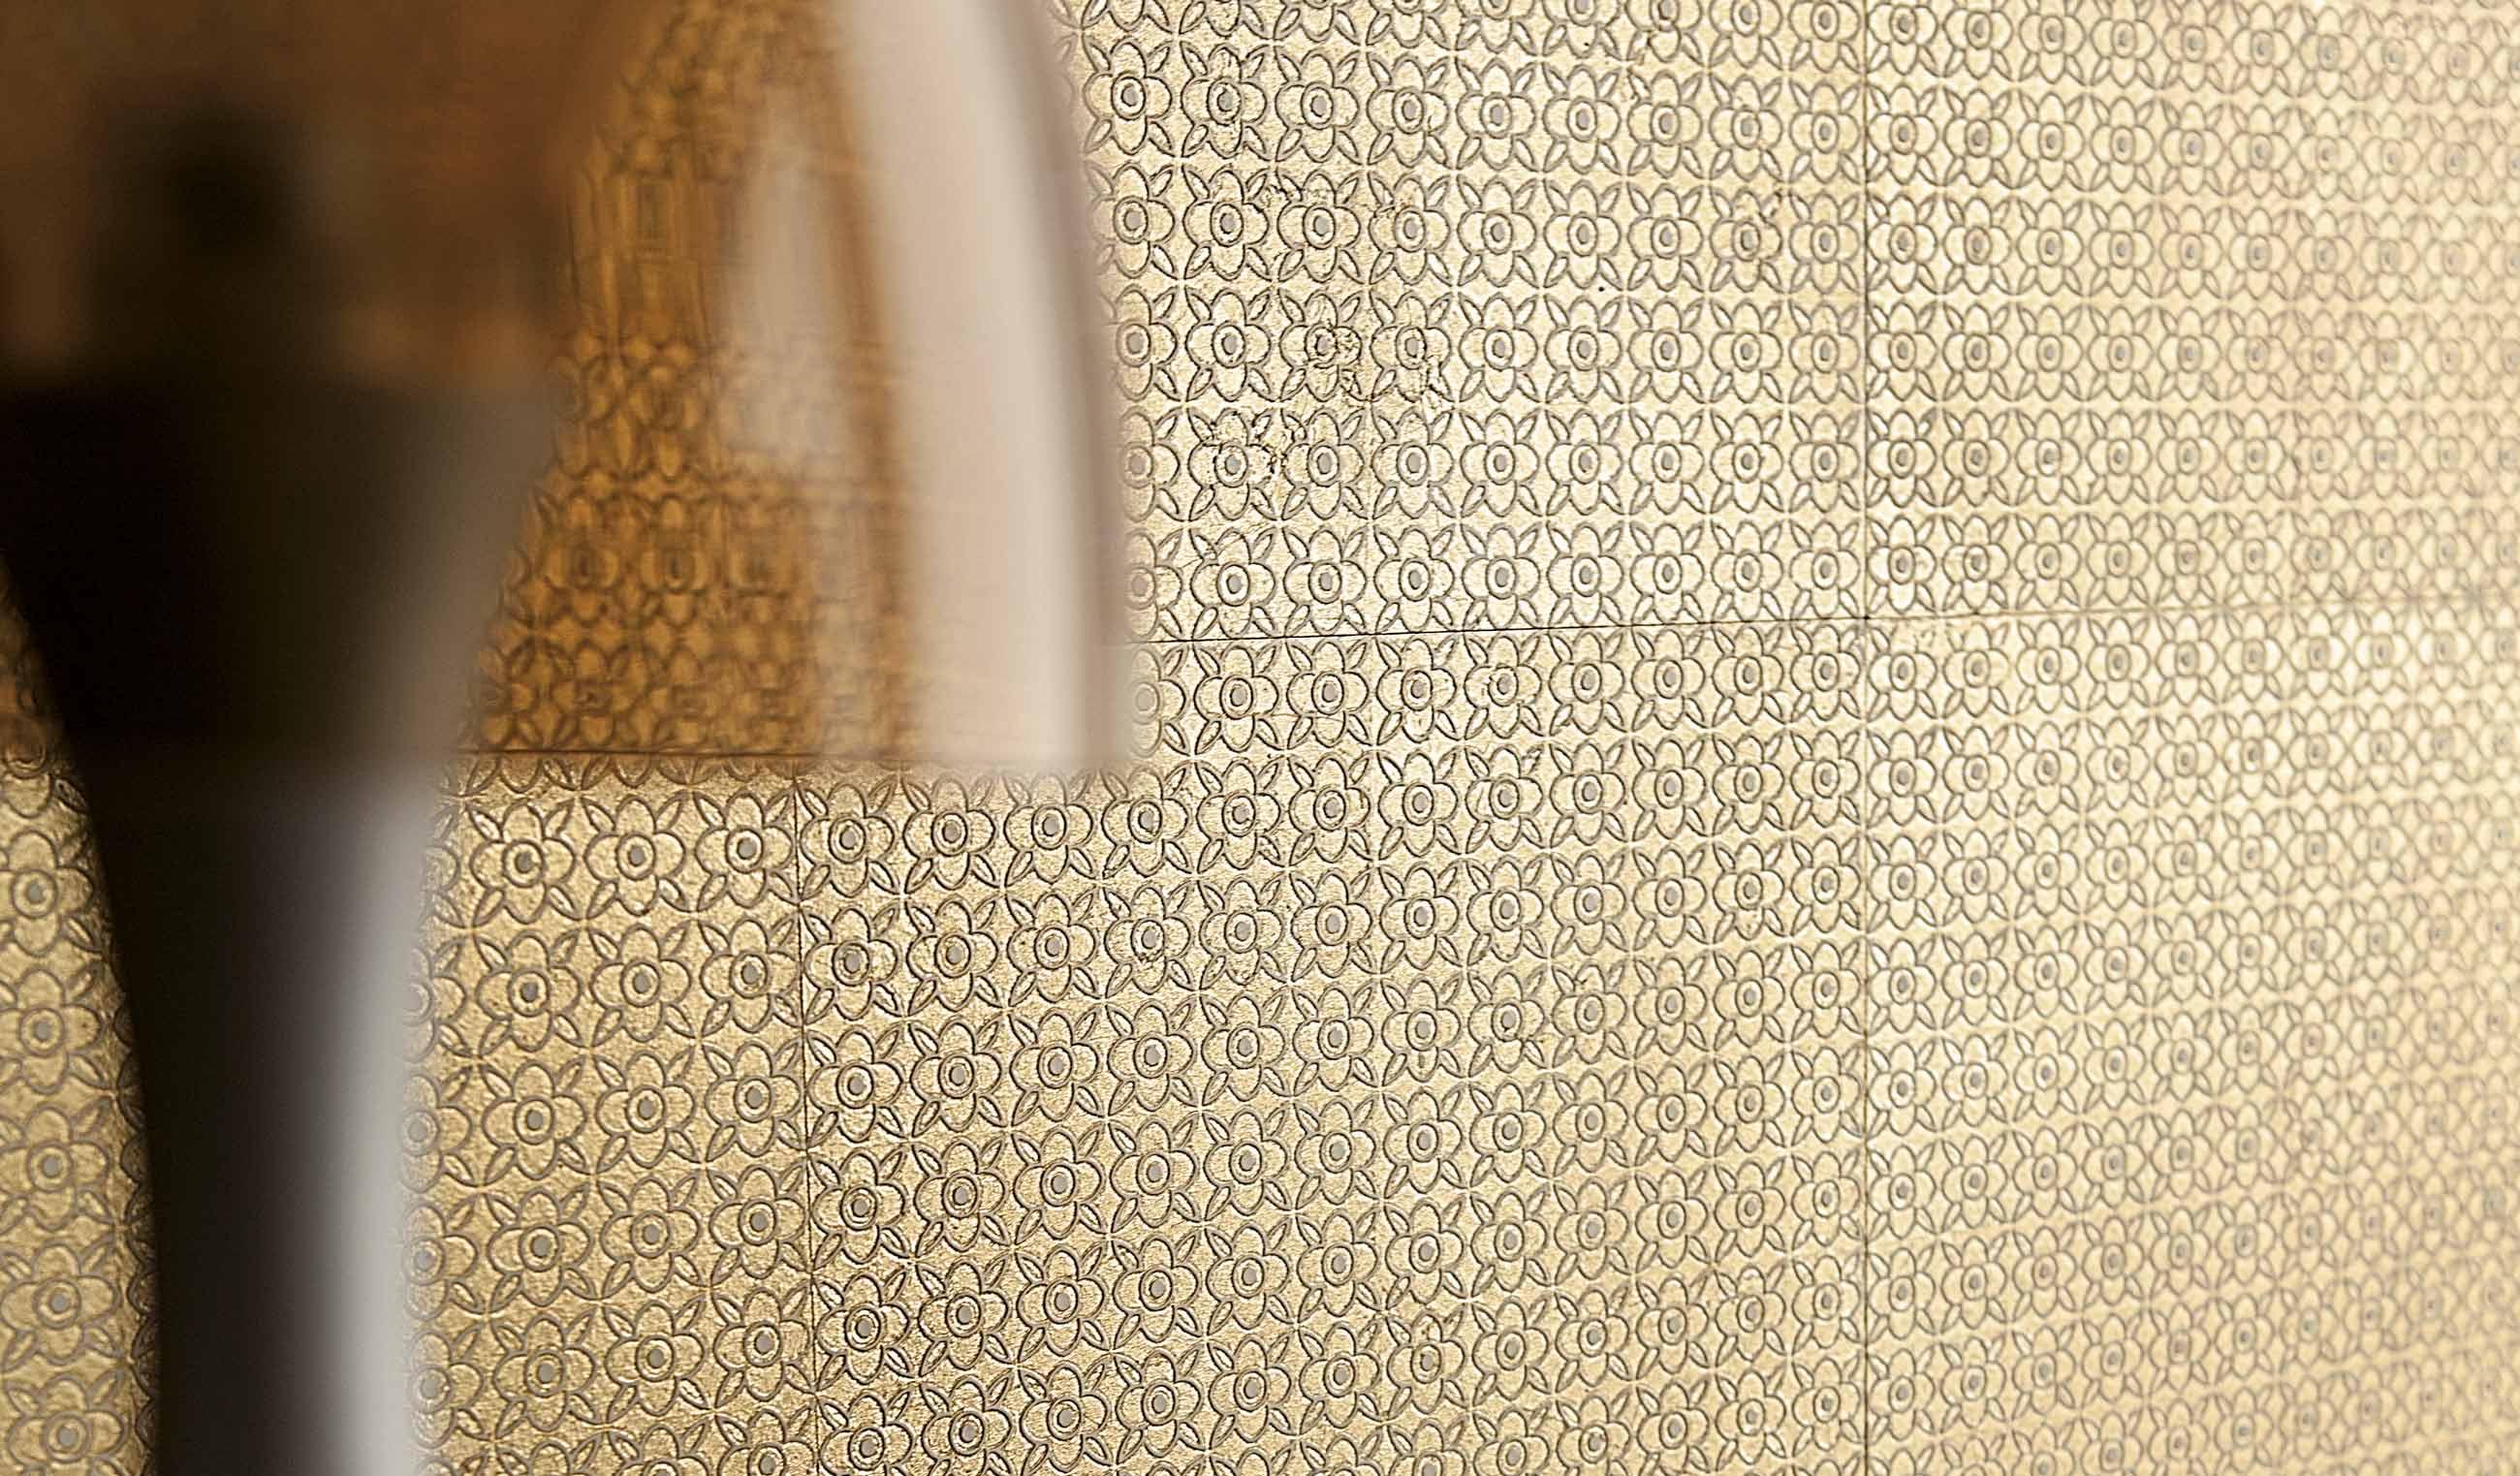 Serenity-intro Lithos mosaico italia